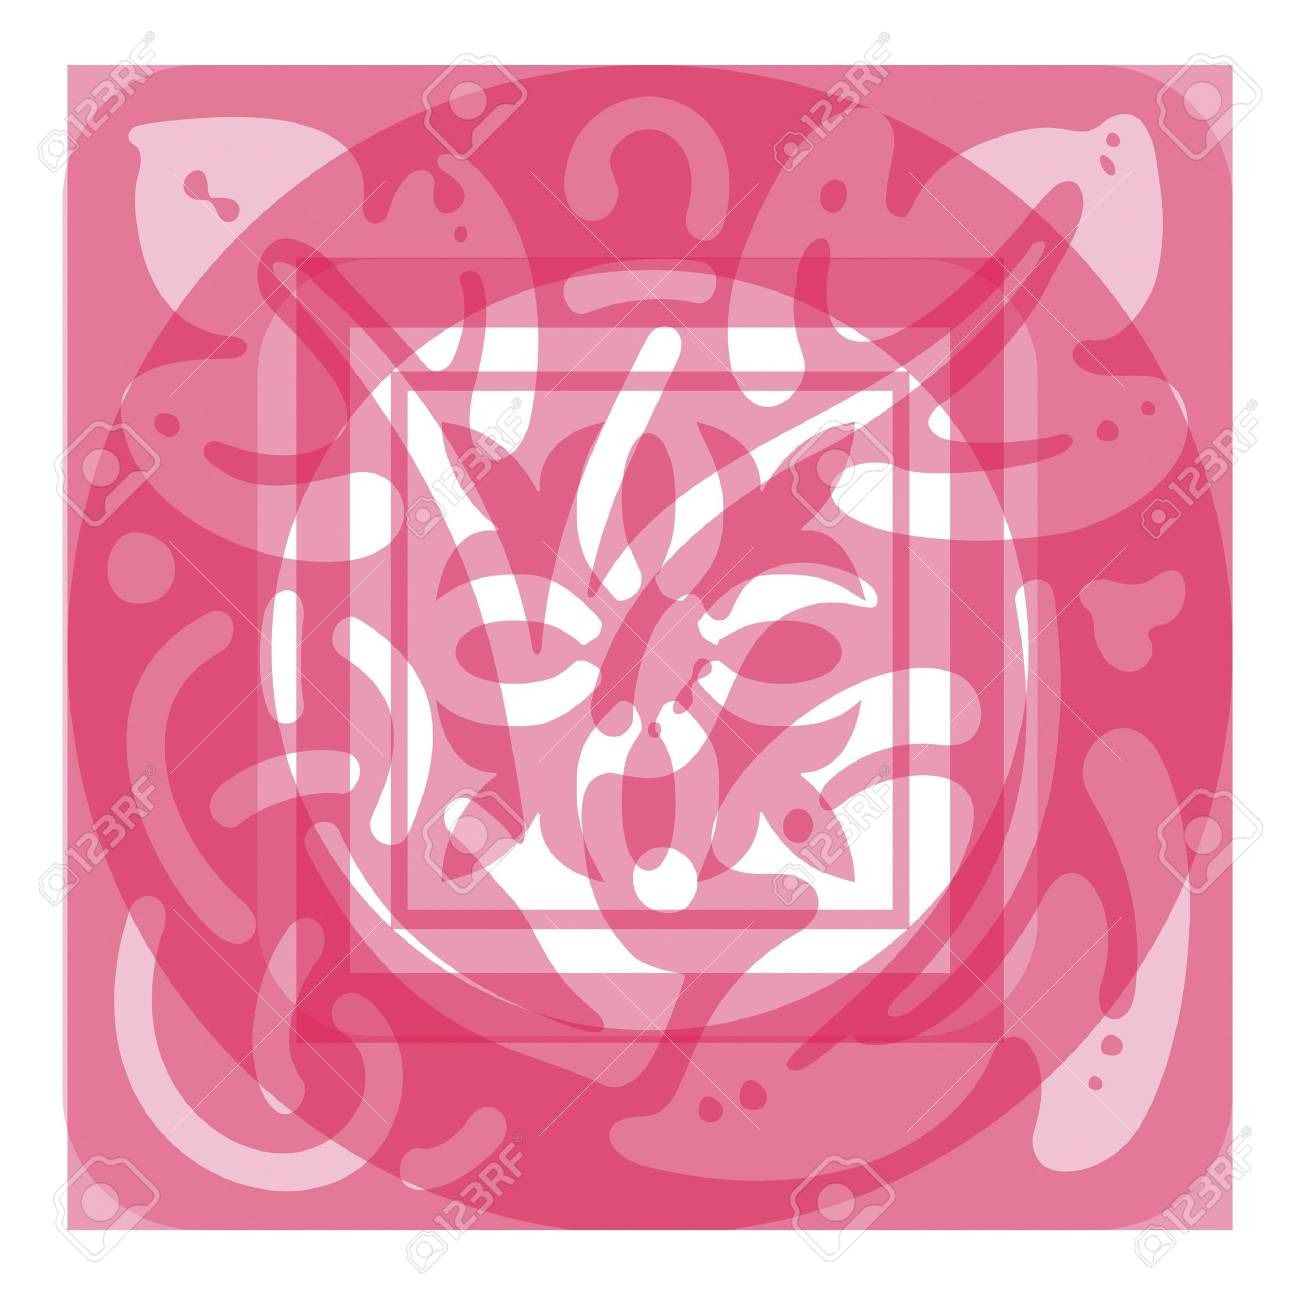 Ornate Panel Scrolled Design Stock Photo - 344901